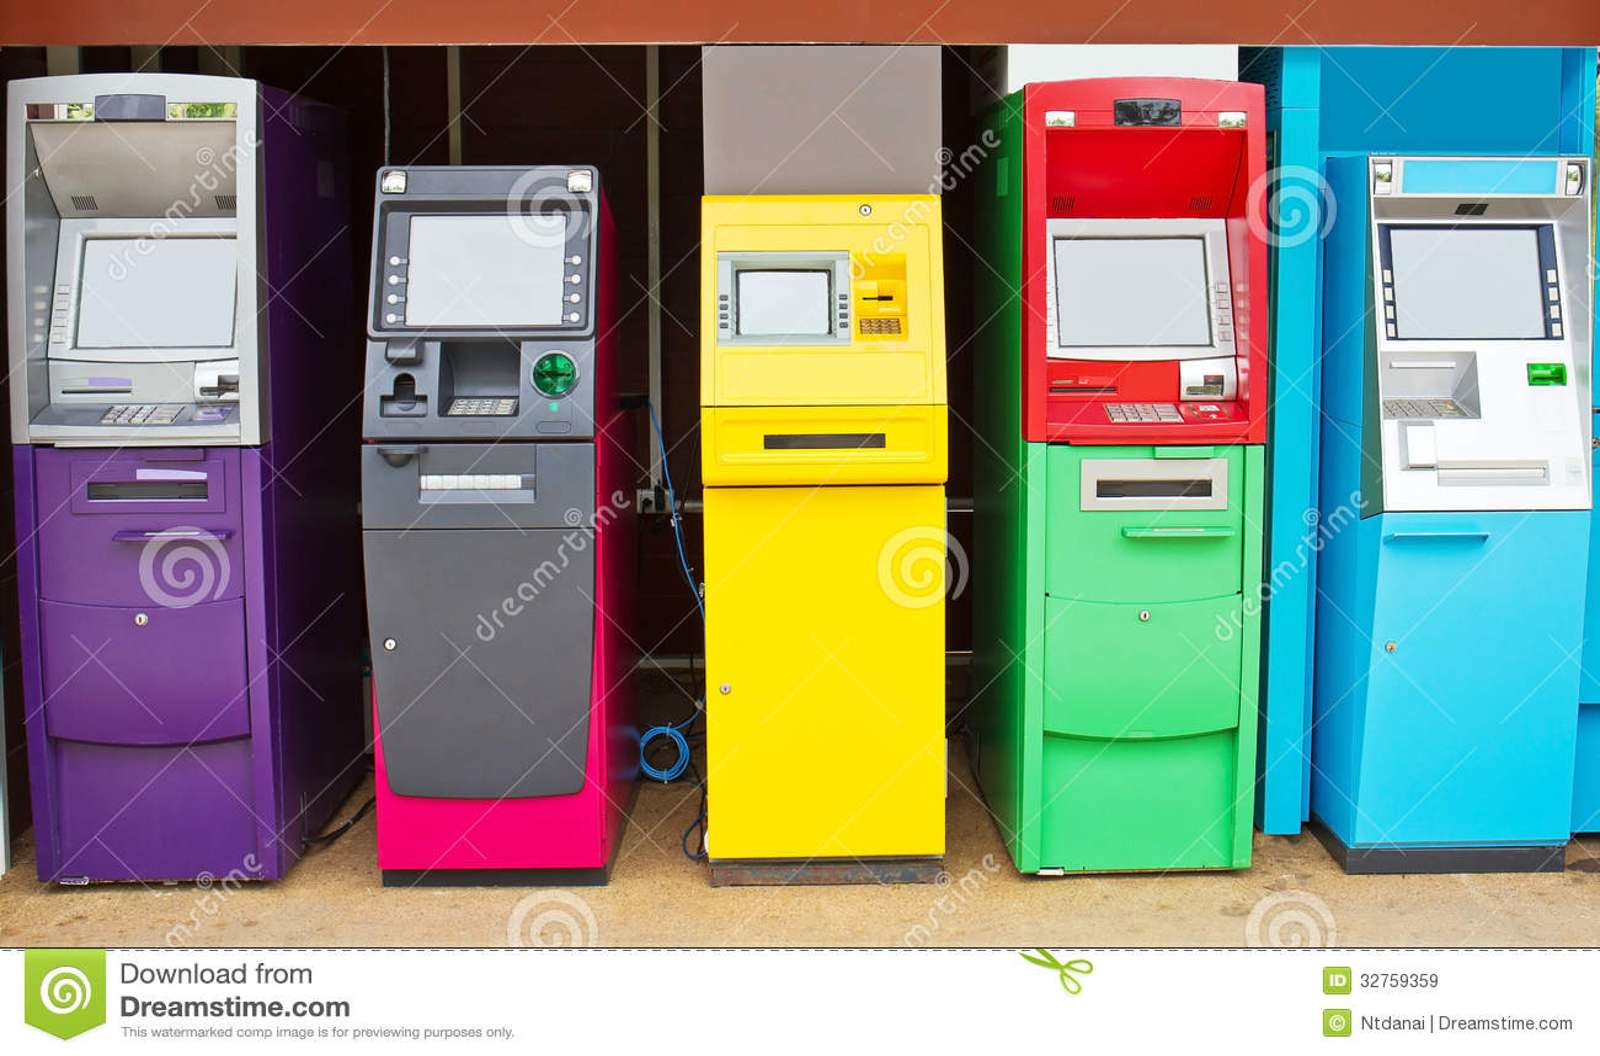 automated teller machine Acronym definition atm: automated teller machine: atm: asynchronous transfer mode (broadband switching and transmission technology) atm: automatic teller machine: atm: air traffi.